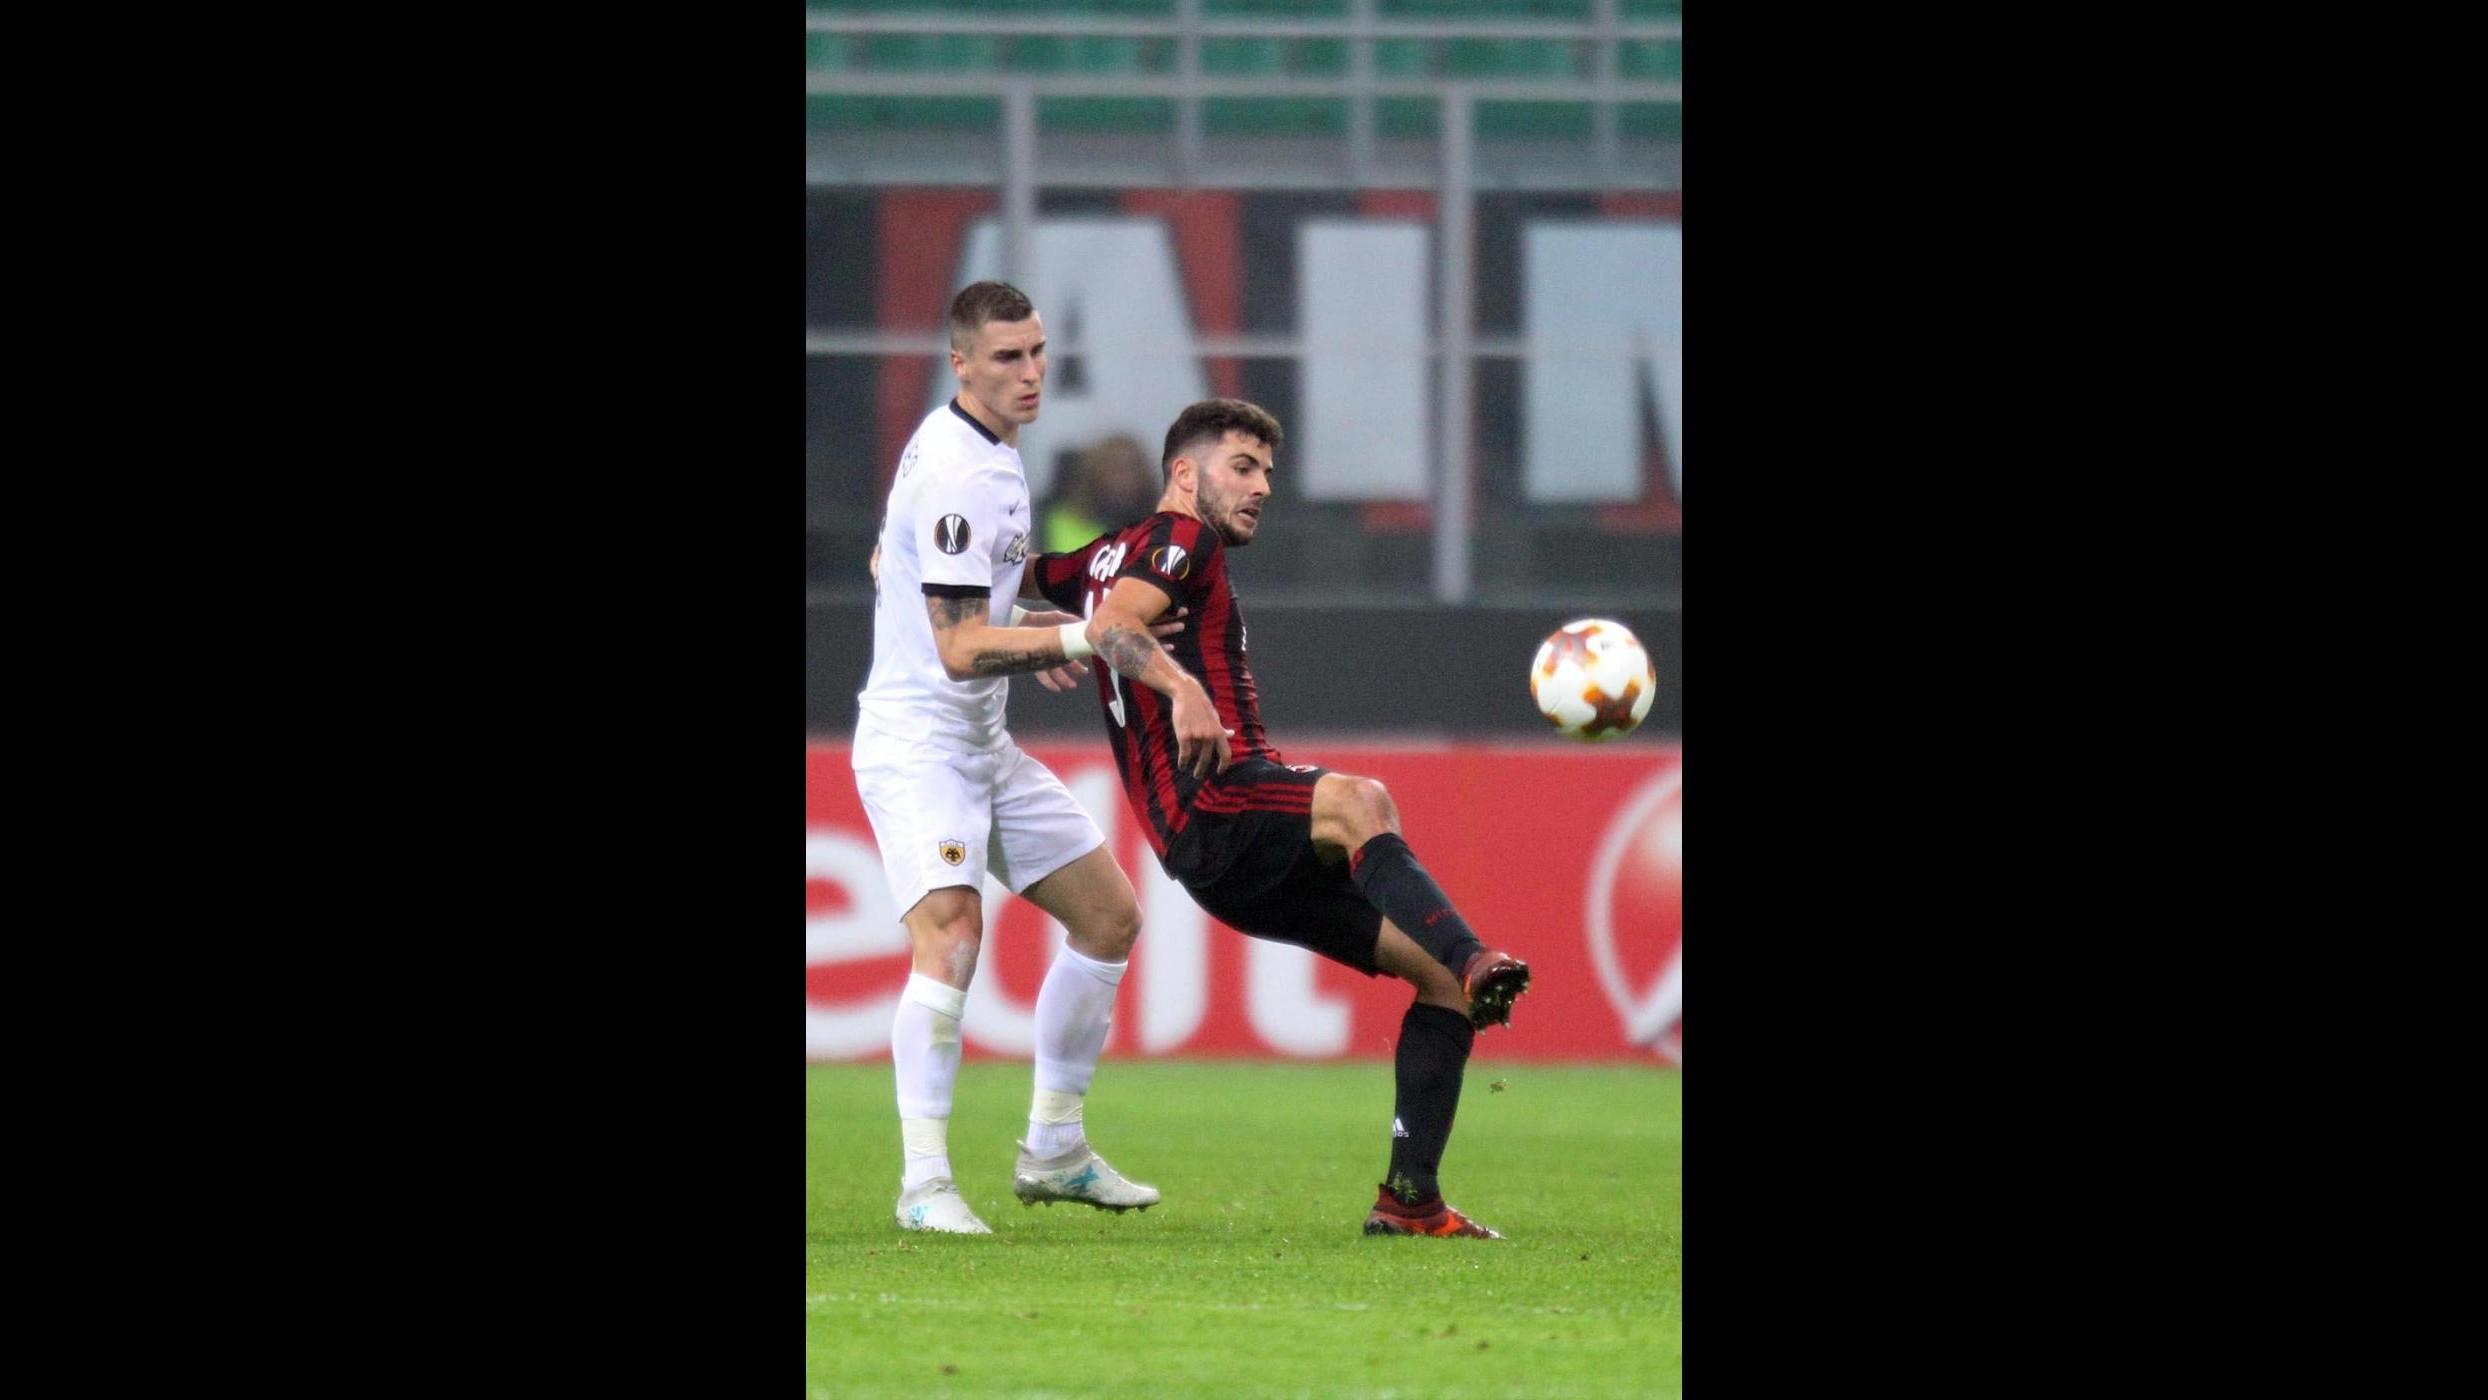 Europa League, Milan-Aek 0-0   Il fotoracconto